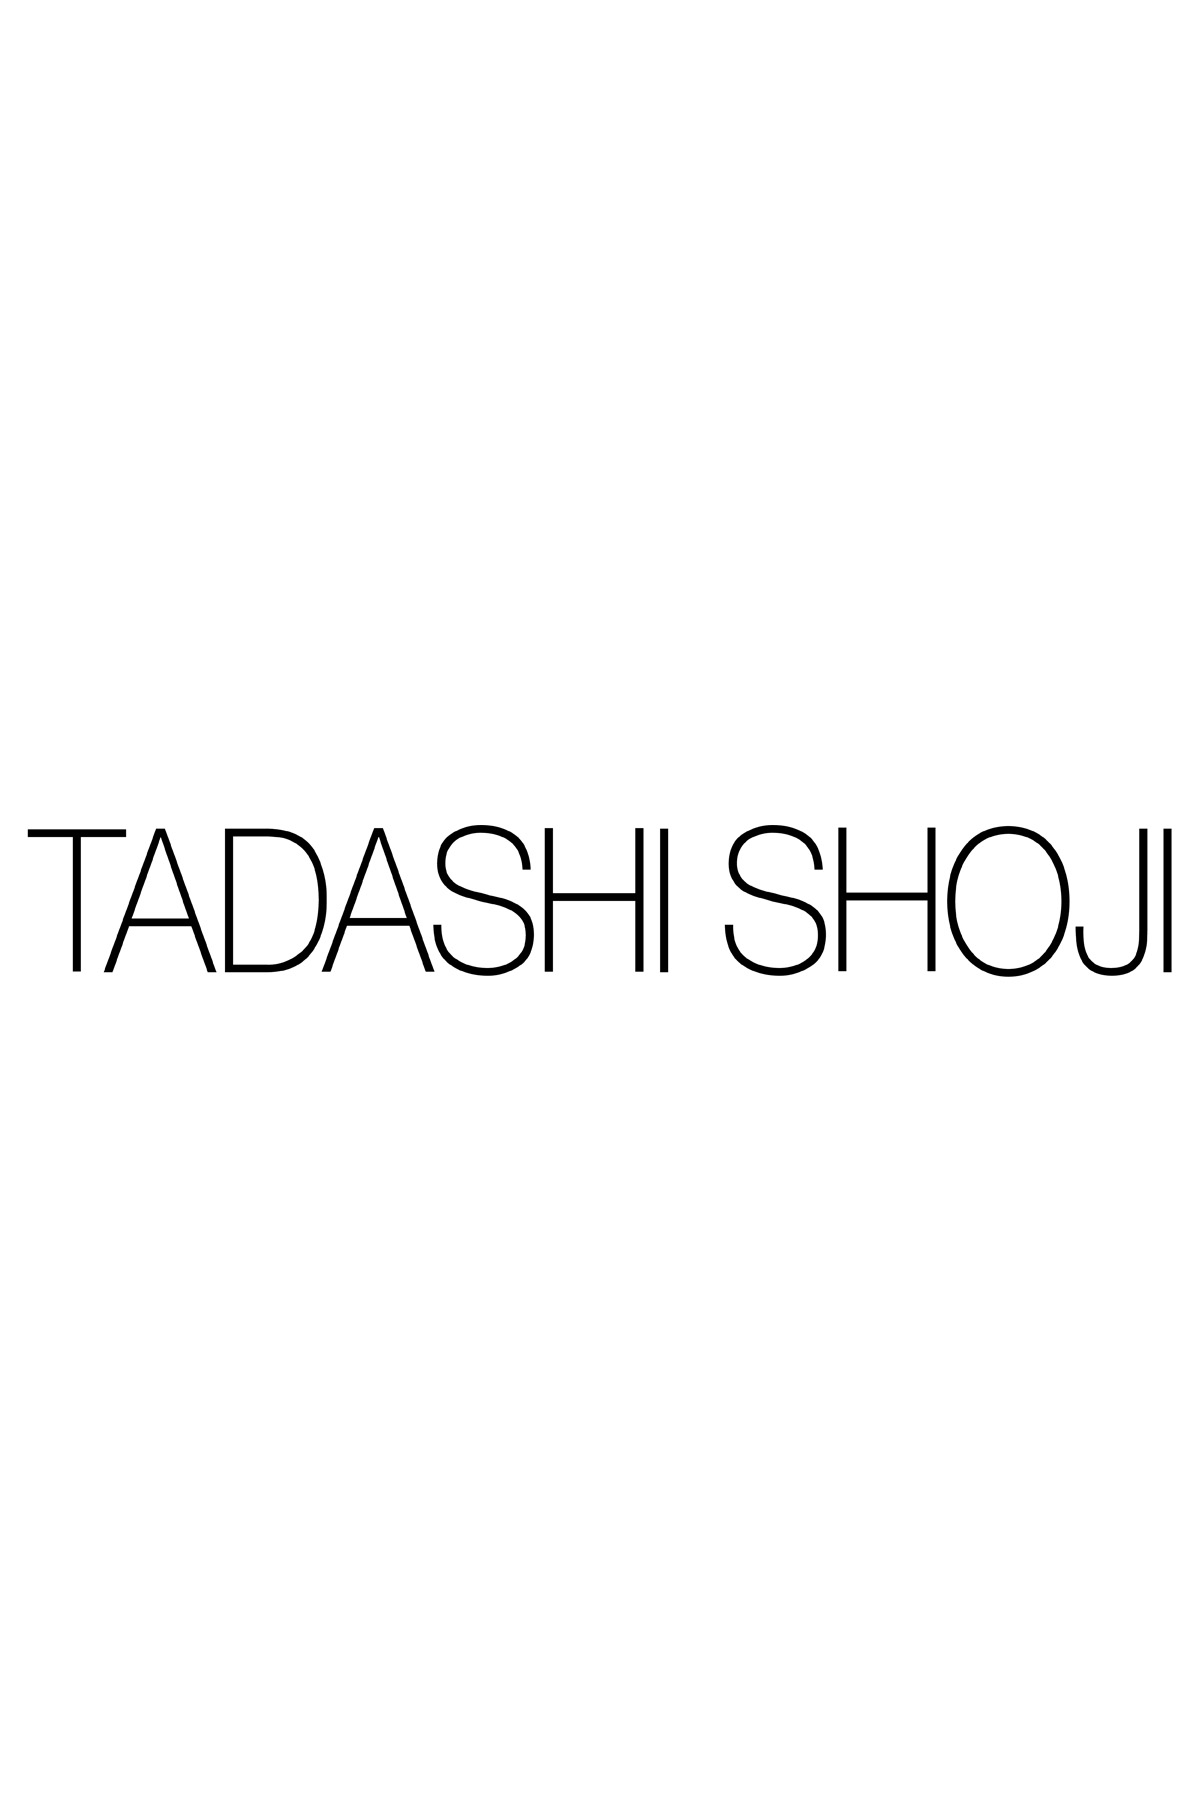 Tadashi Shoji - Corded Embroidery on Tulle 3/4 Sleeve Dress